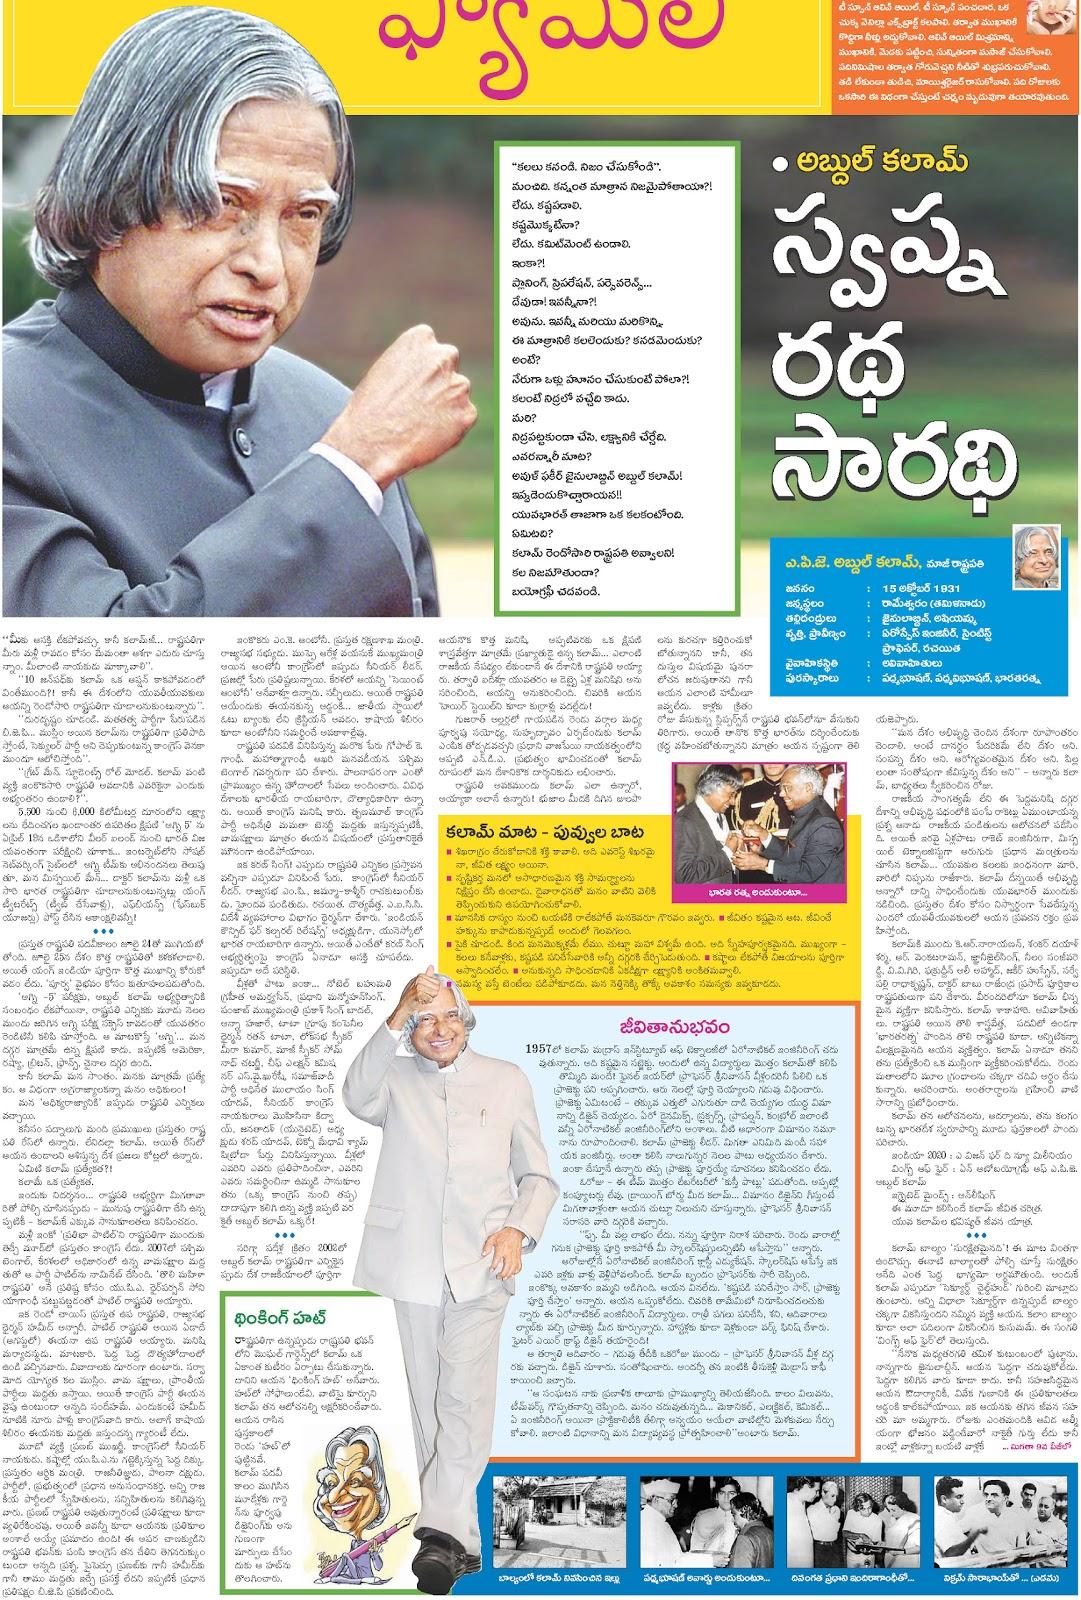 apj abdul kalam biography in hindi pdf free download